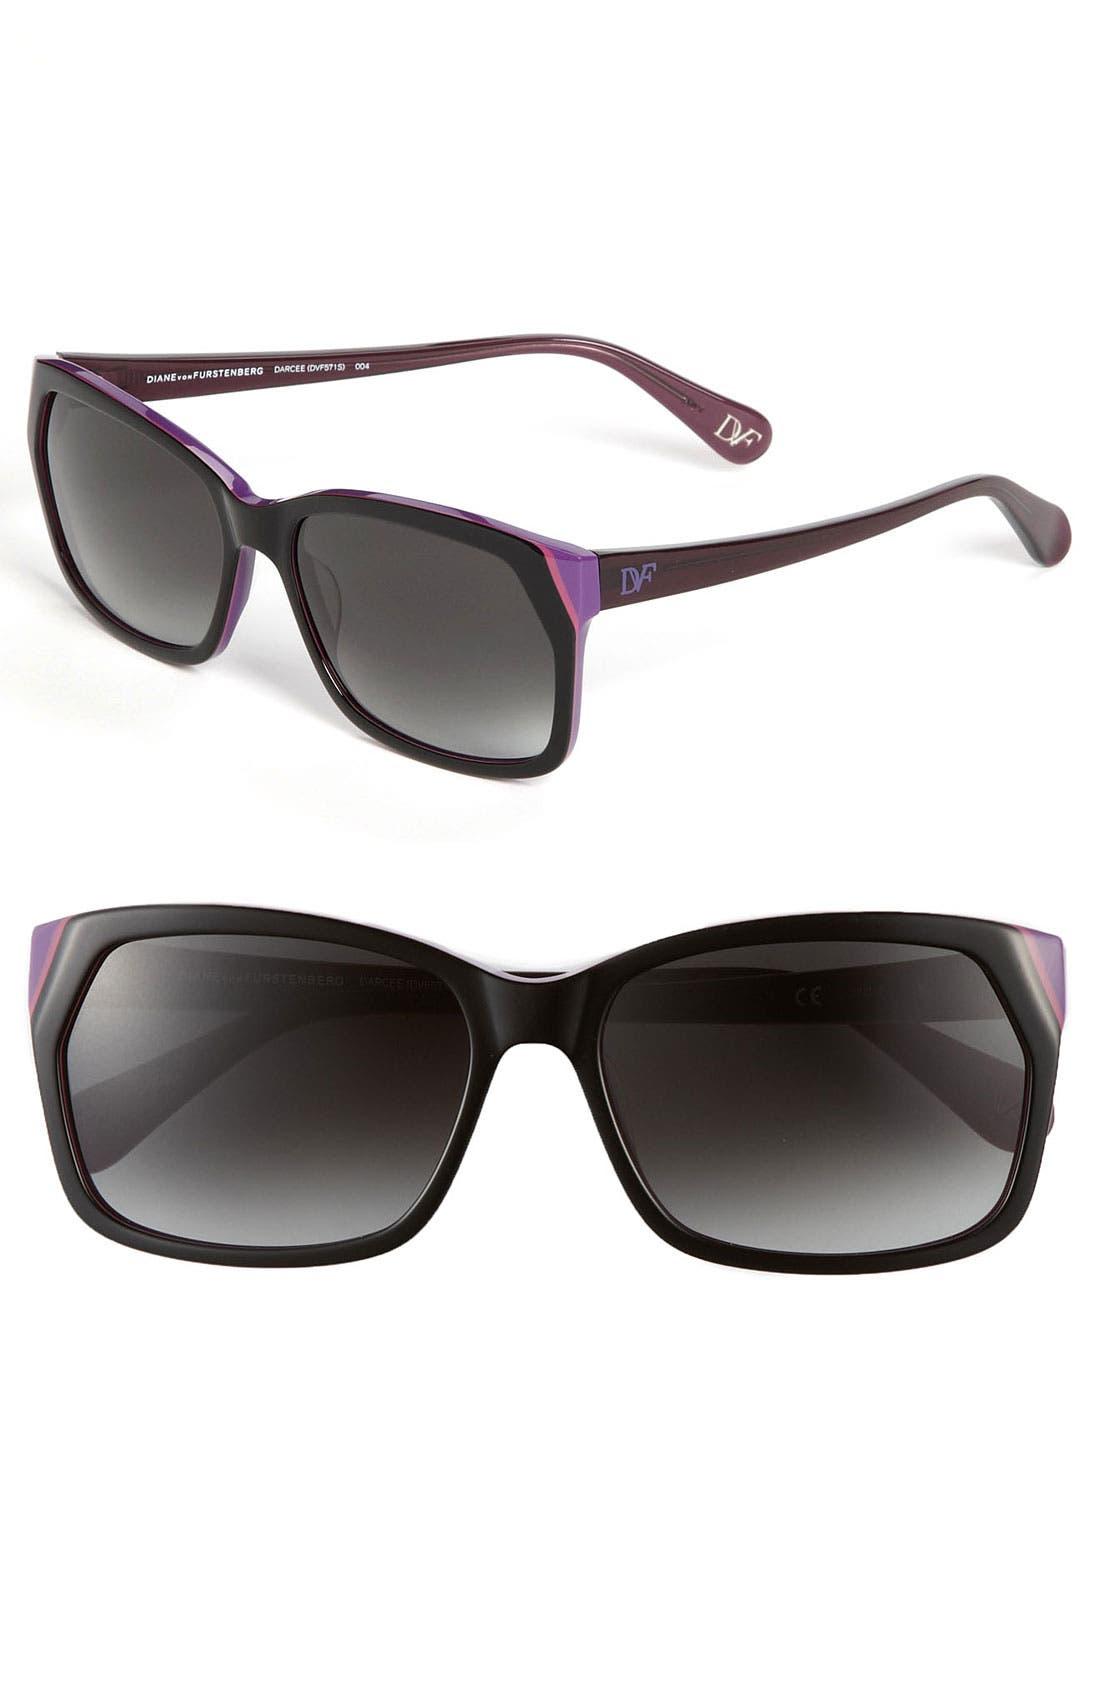 Main Image - Diane von Furstenberg 'Basic' Sunglasses